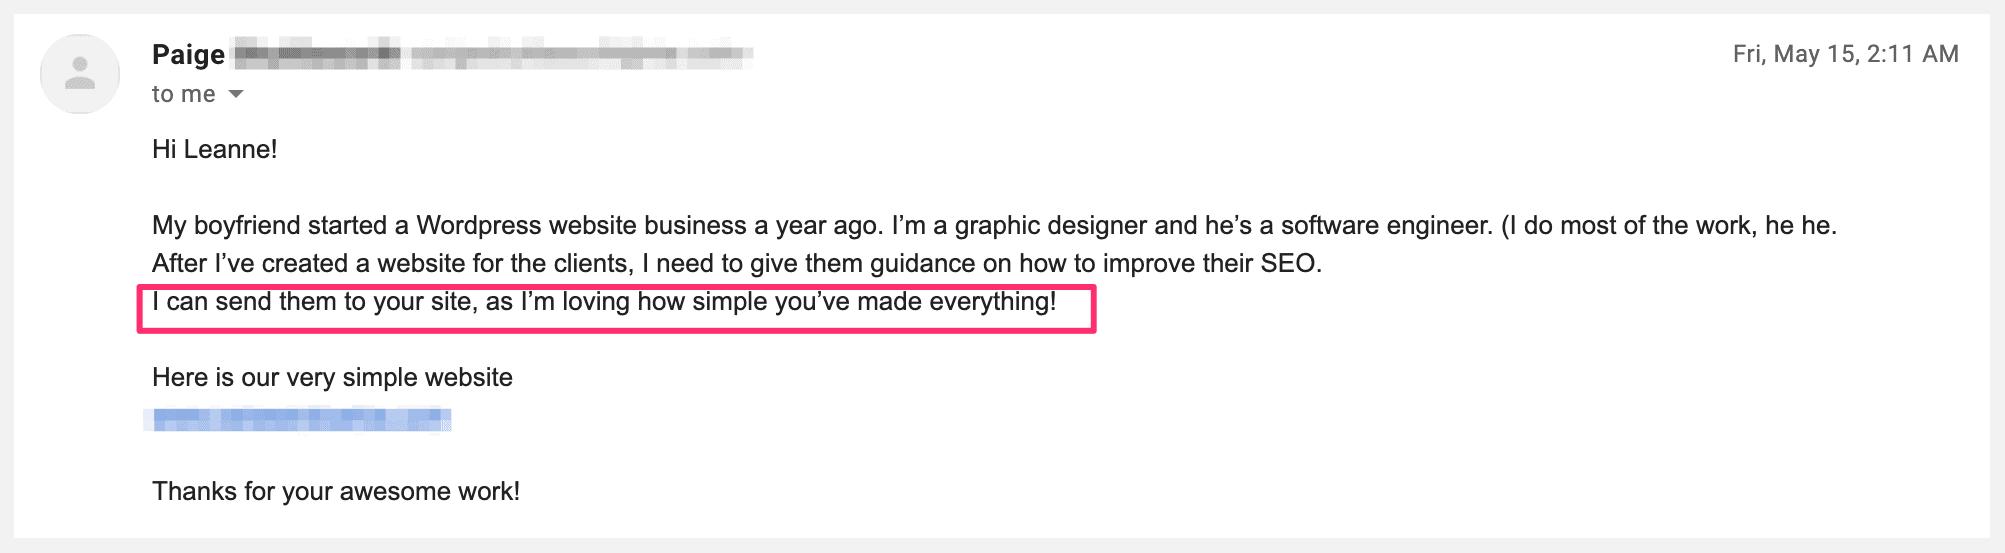 seo client enquiry feedback